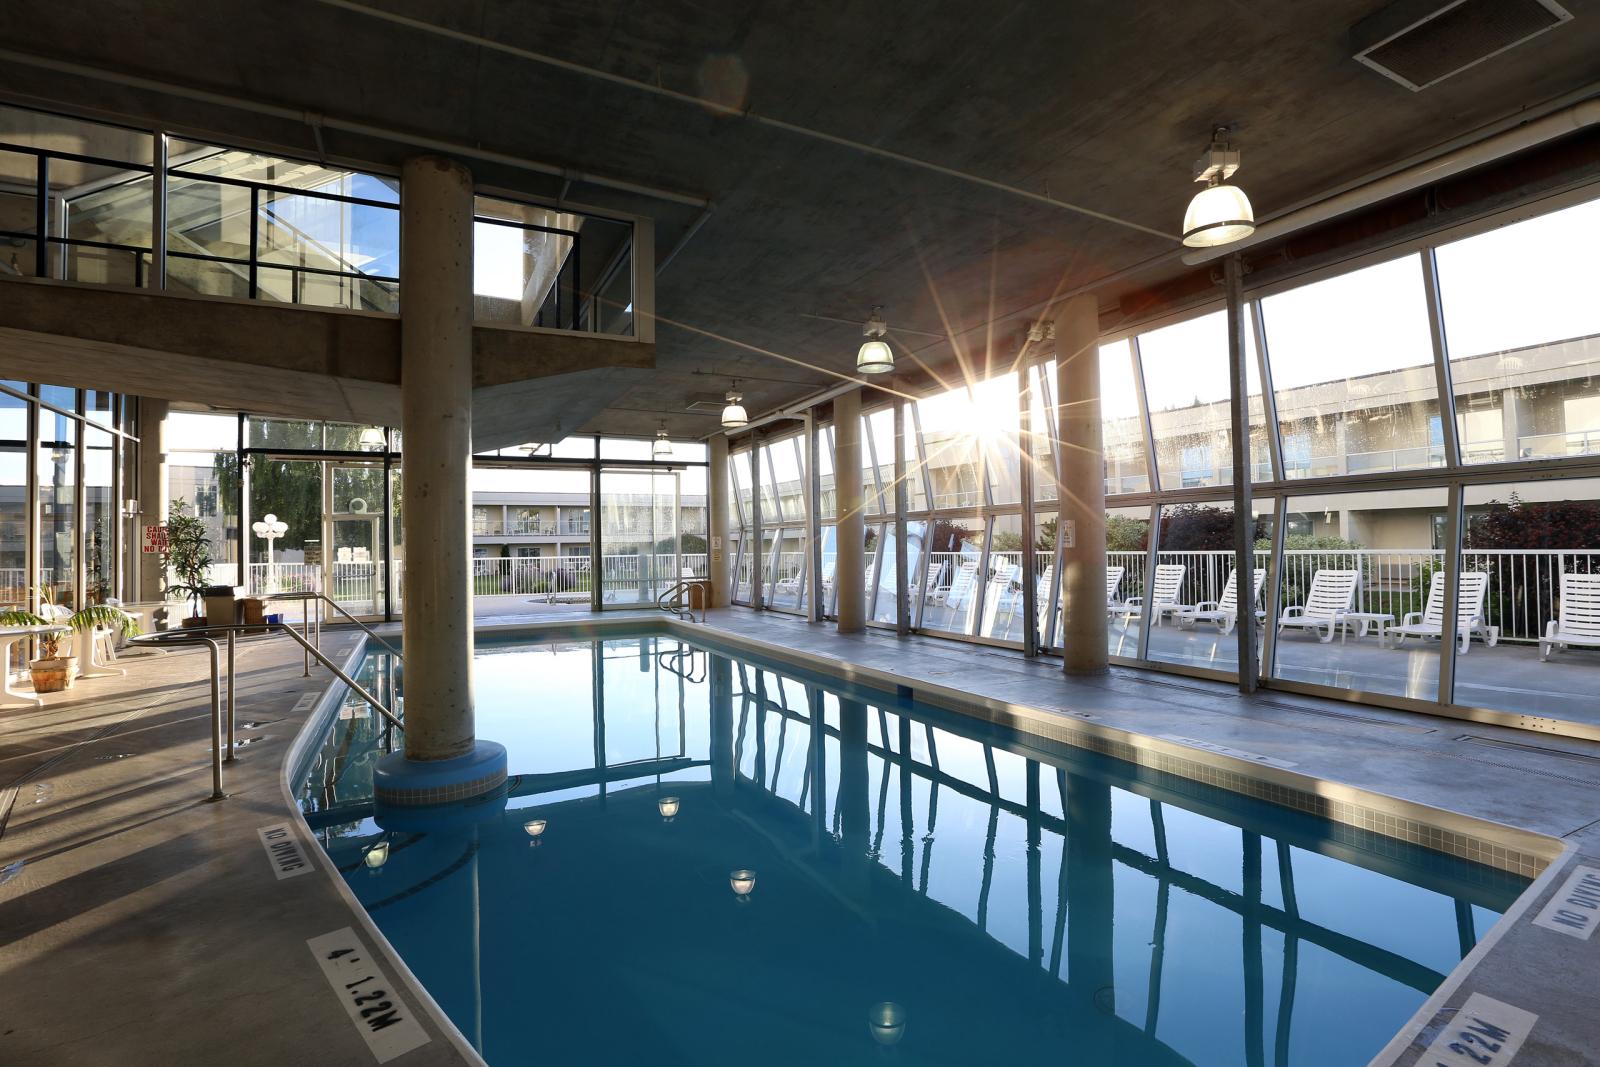 kelowna swimming pool thompson okanagan british columbia tourism making the